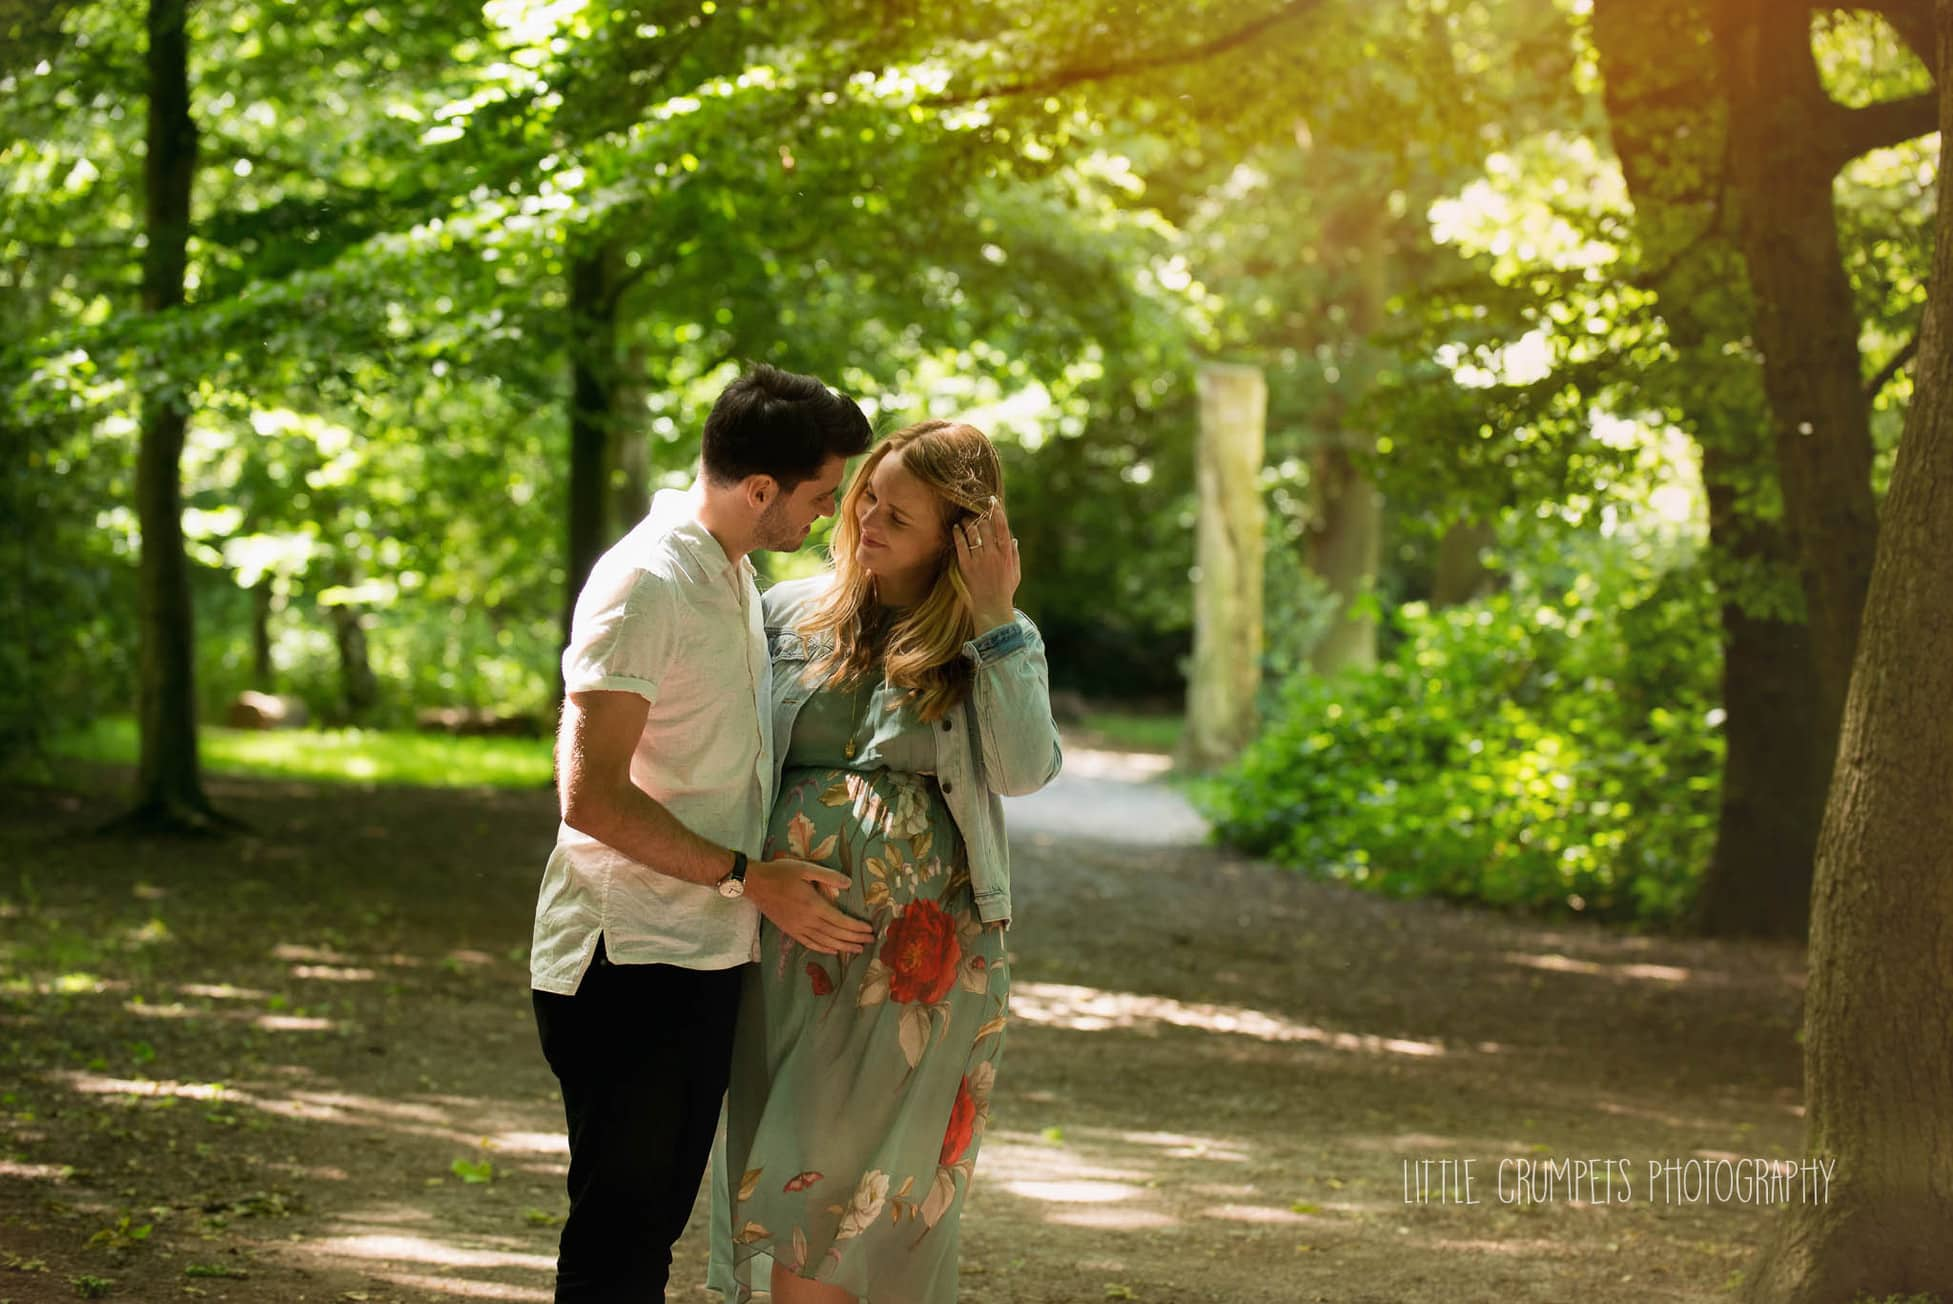 London-maternity-photographer-2015